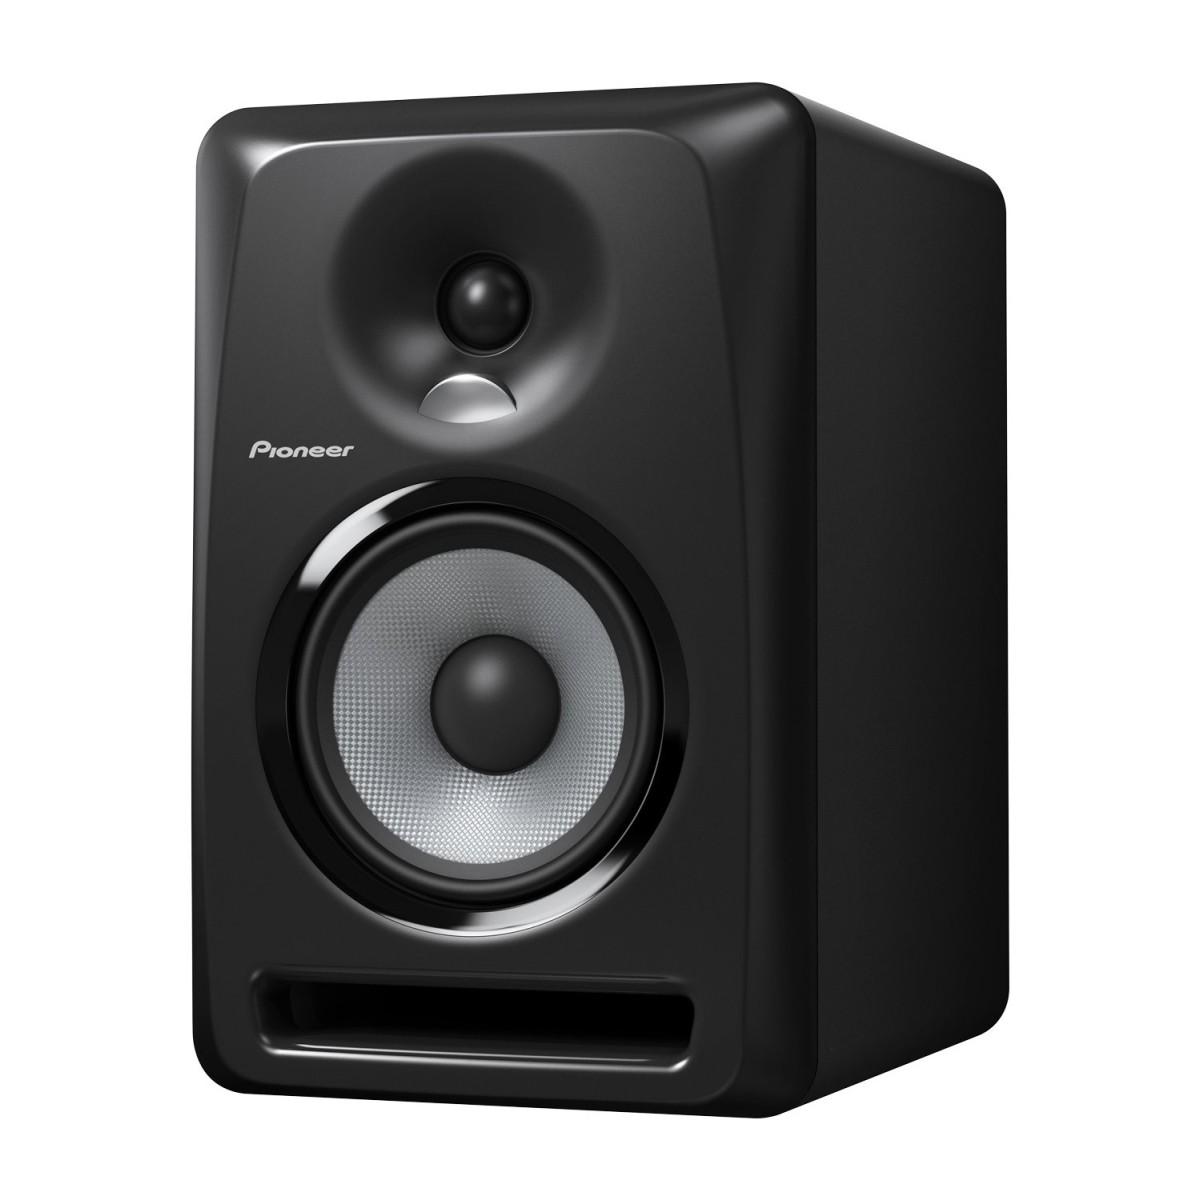 MONITOR SPEAKER PIONEER S-DJ50X 5